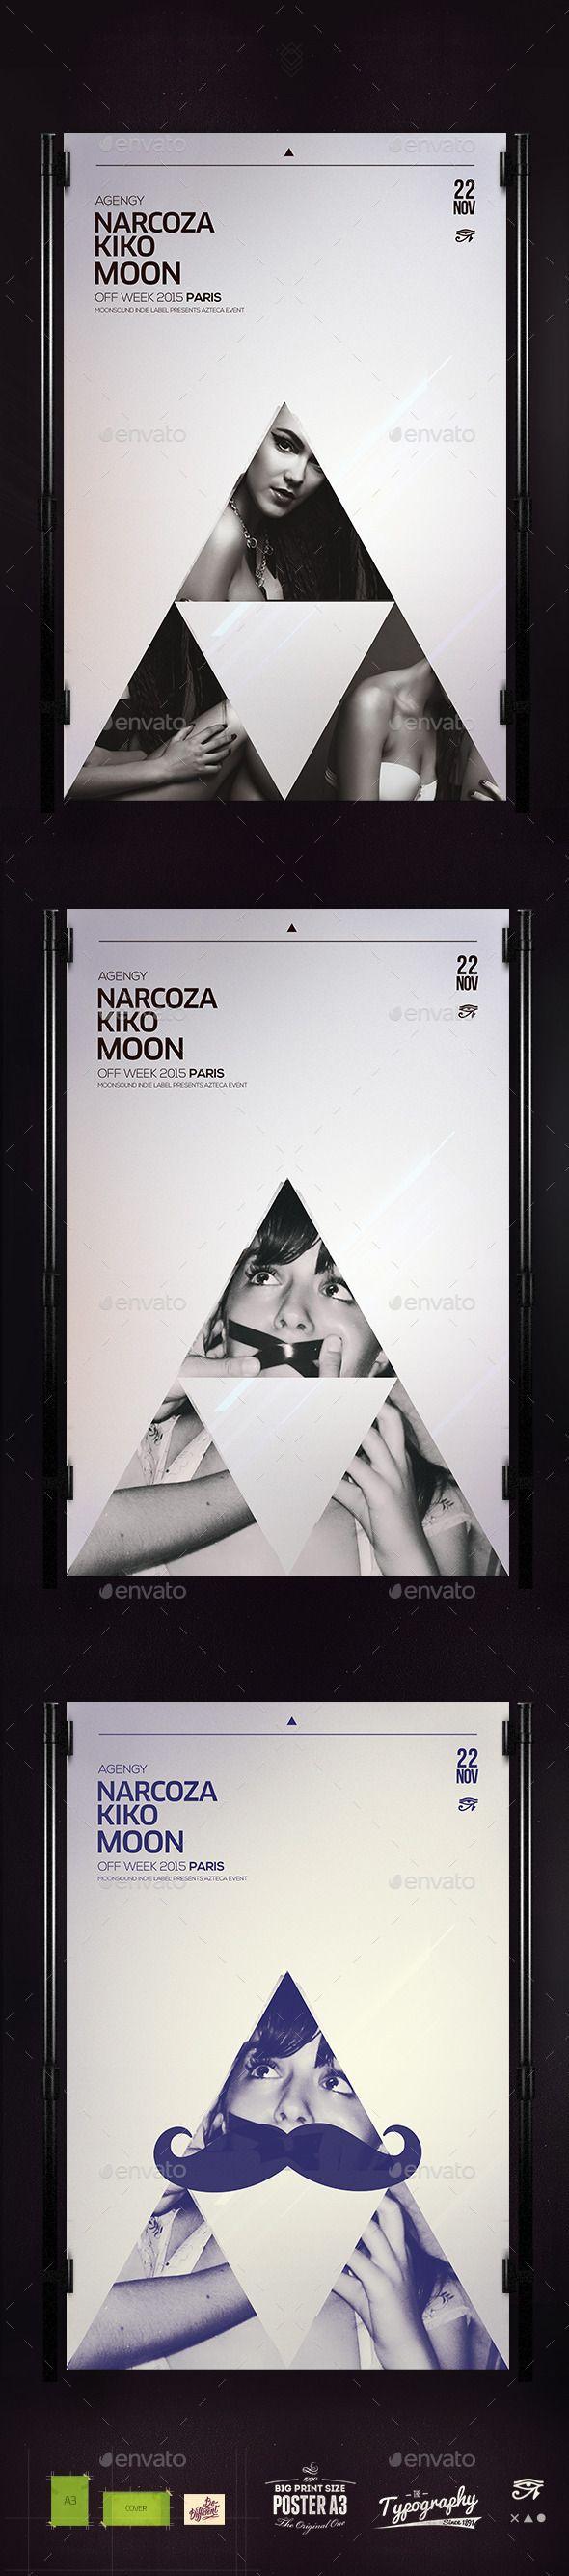 Minimal Hipster Poster 逆三角形あるある